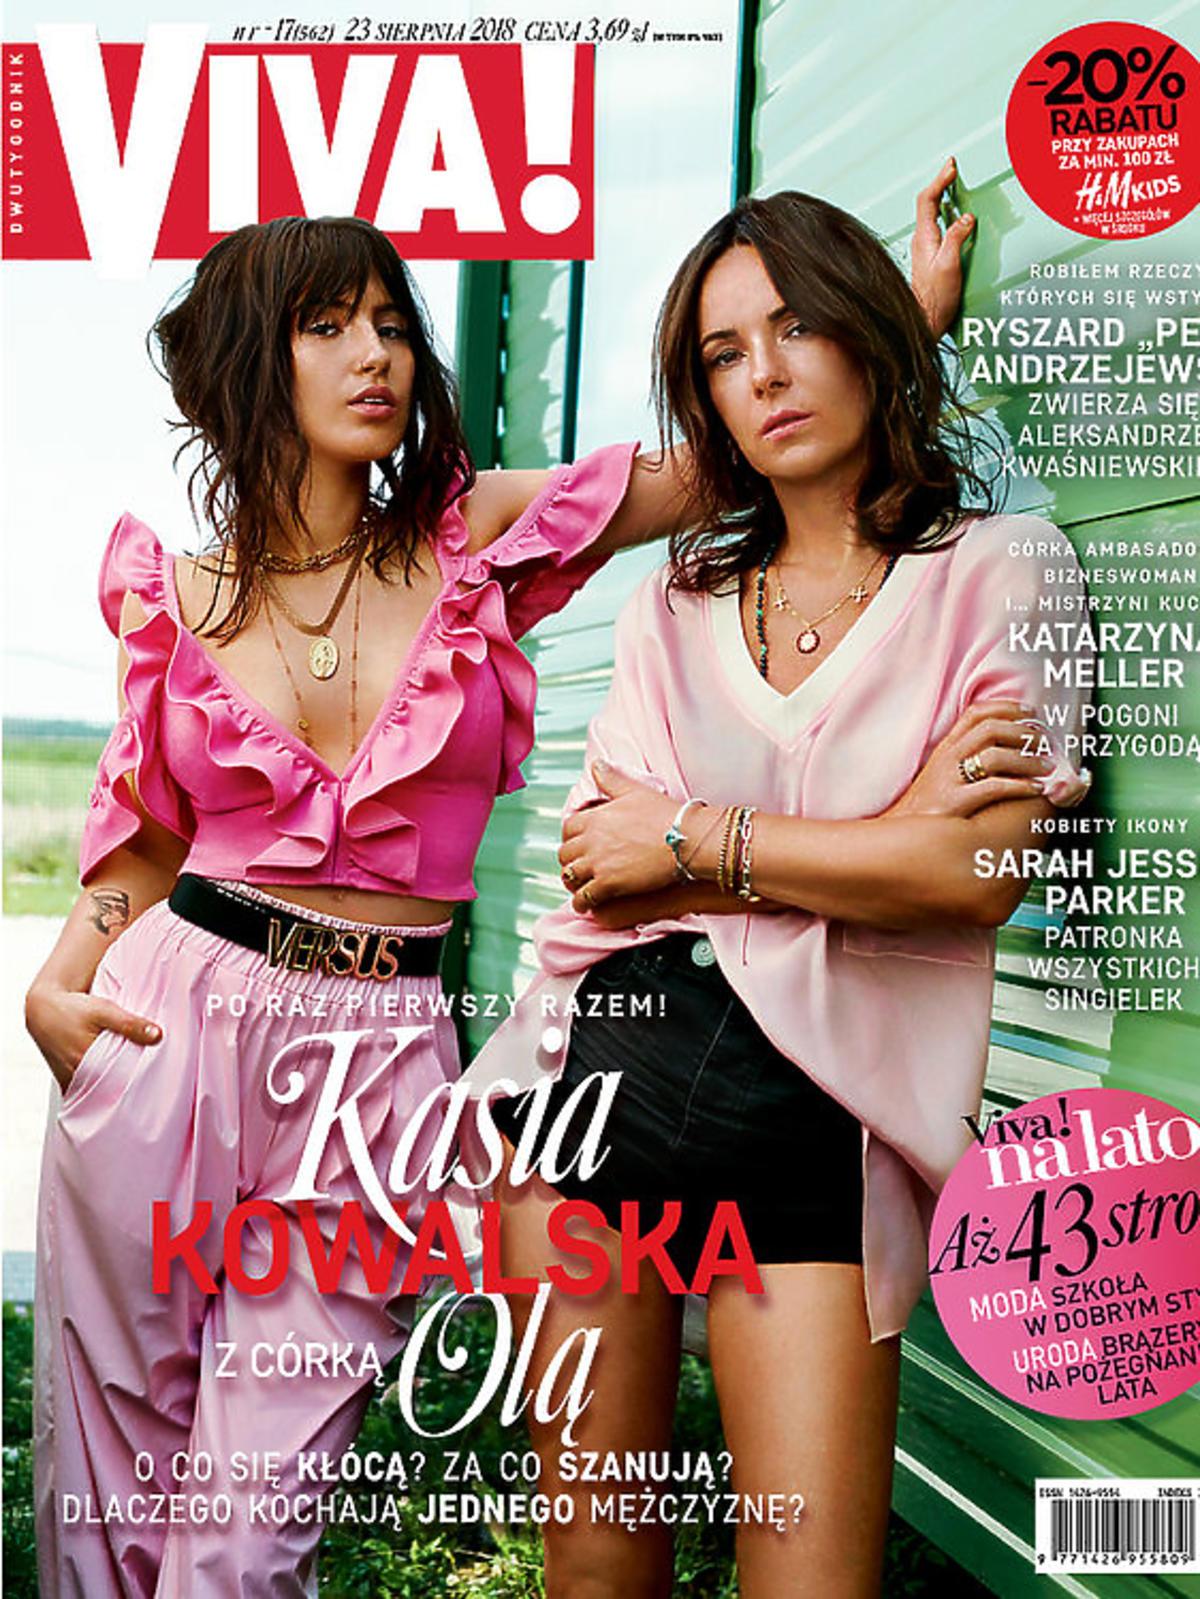 Kasia Kowalska z córką na okładce Viva